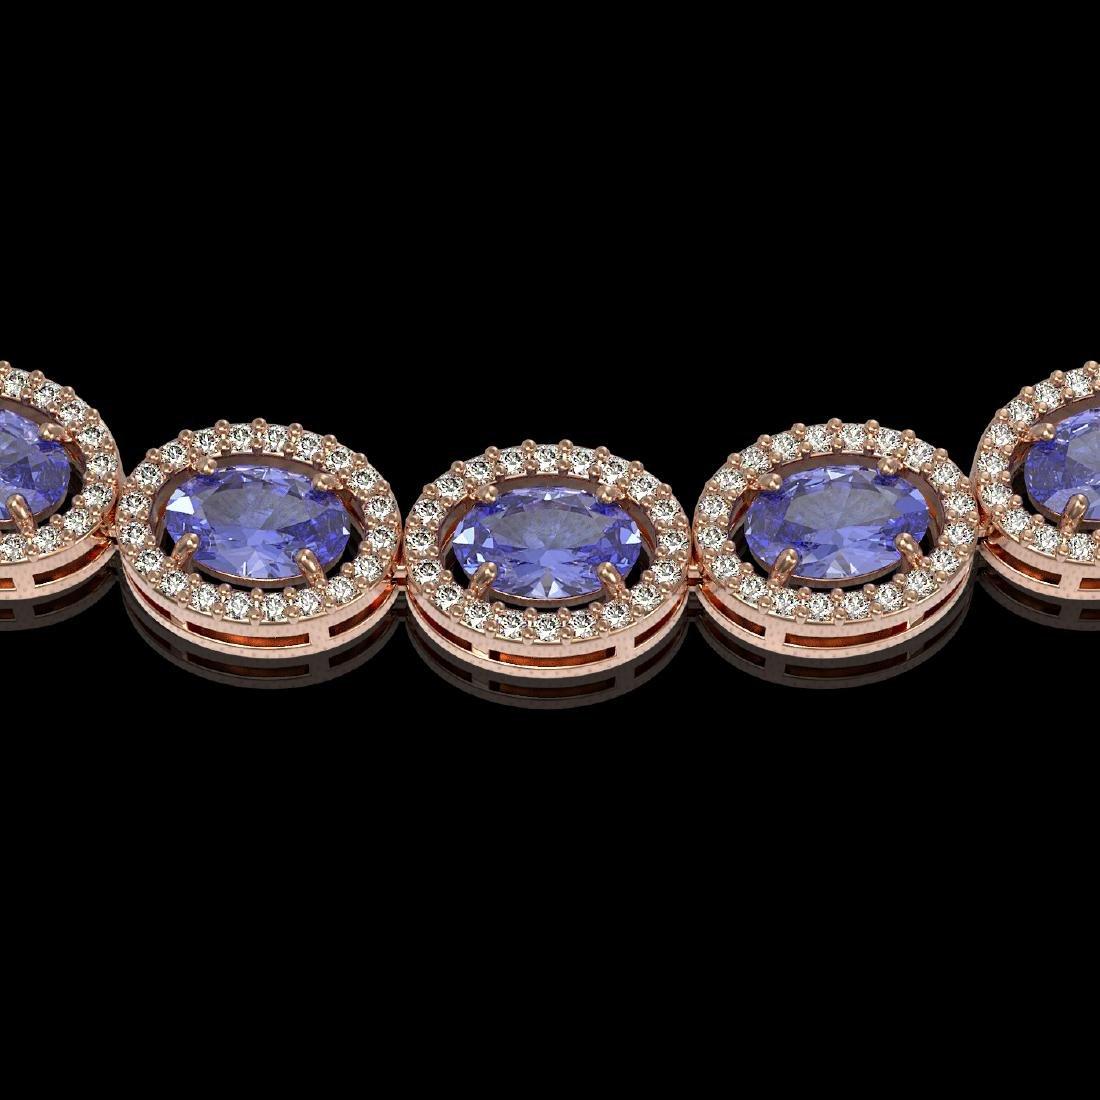 31.96 CTW Tanzanite & Diamond Halo Necklace 10K Rose - 3